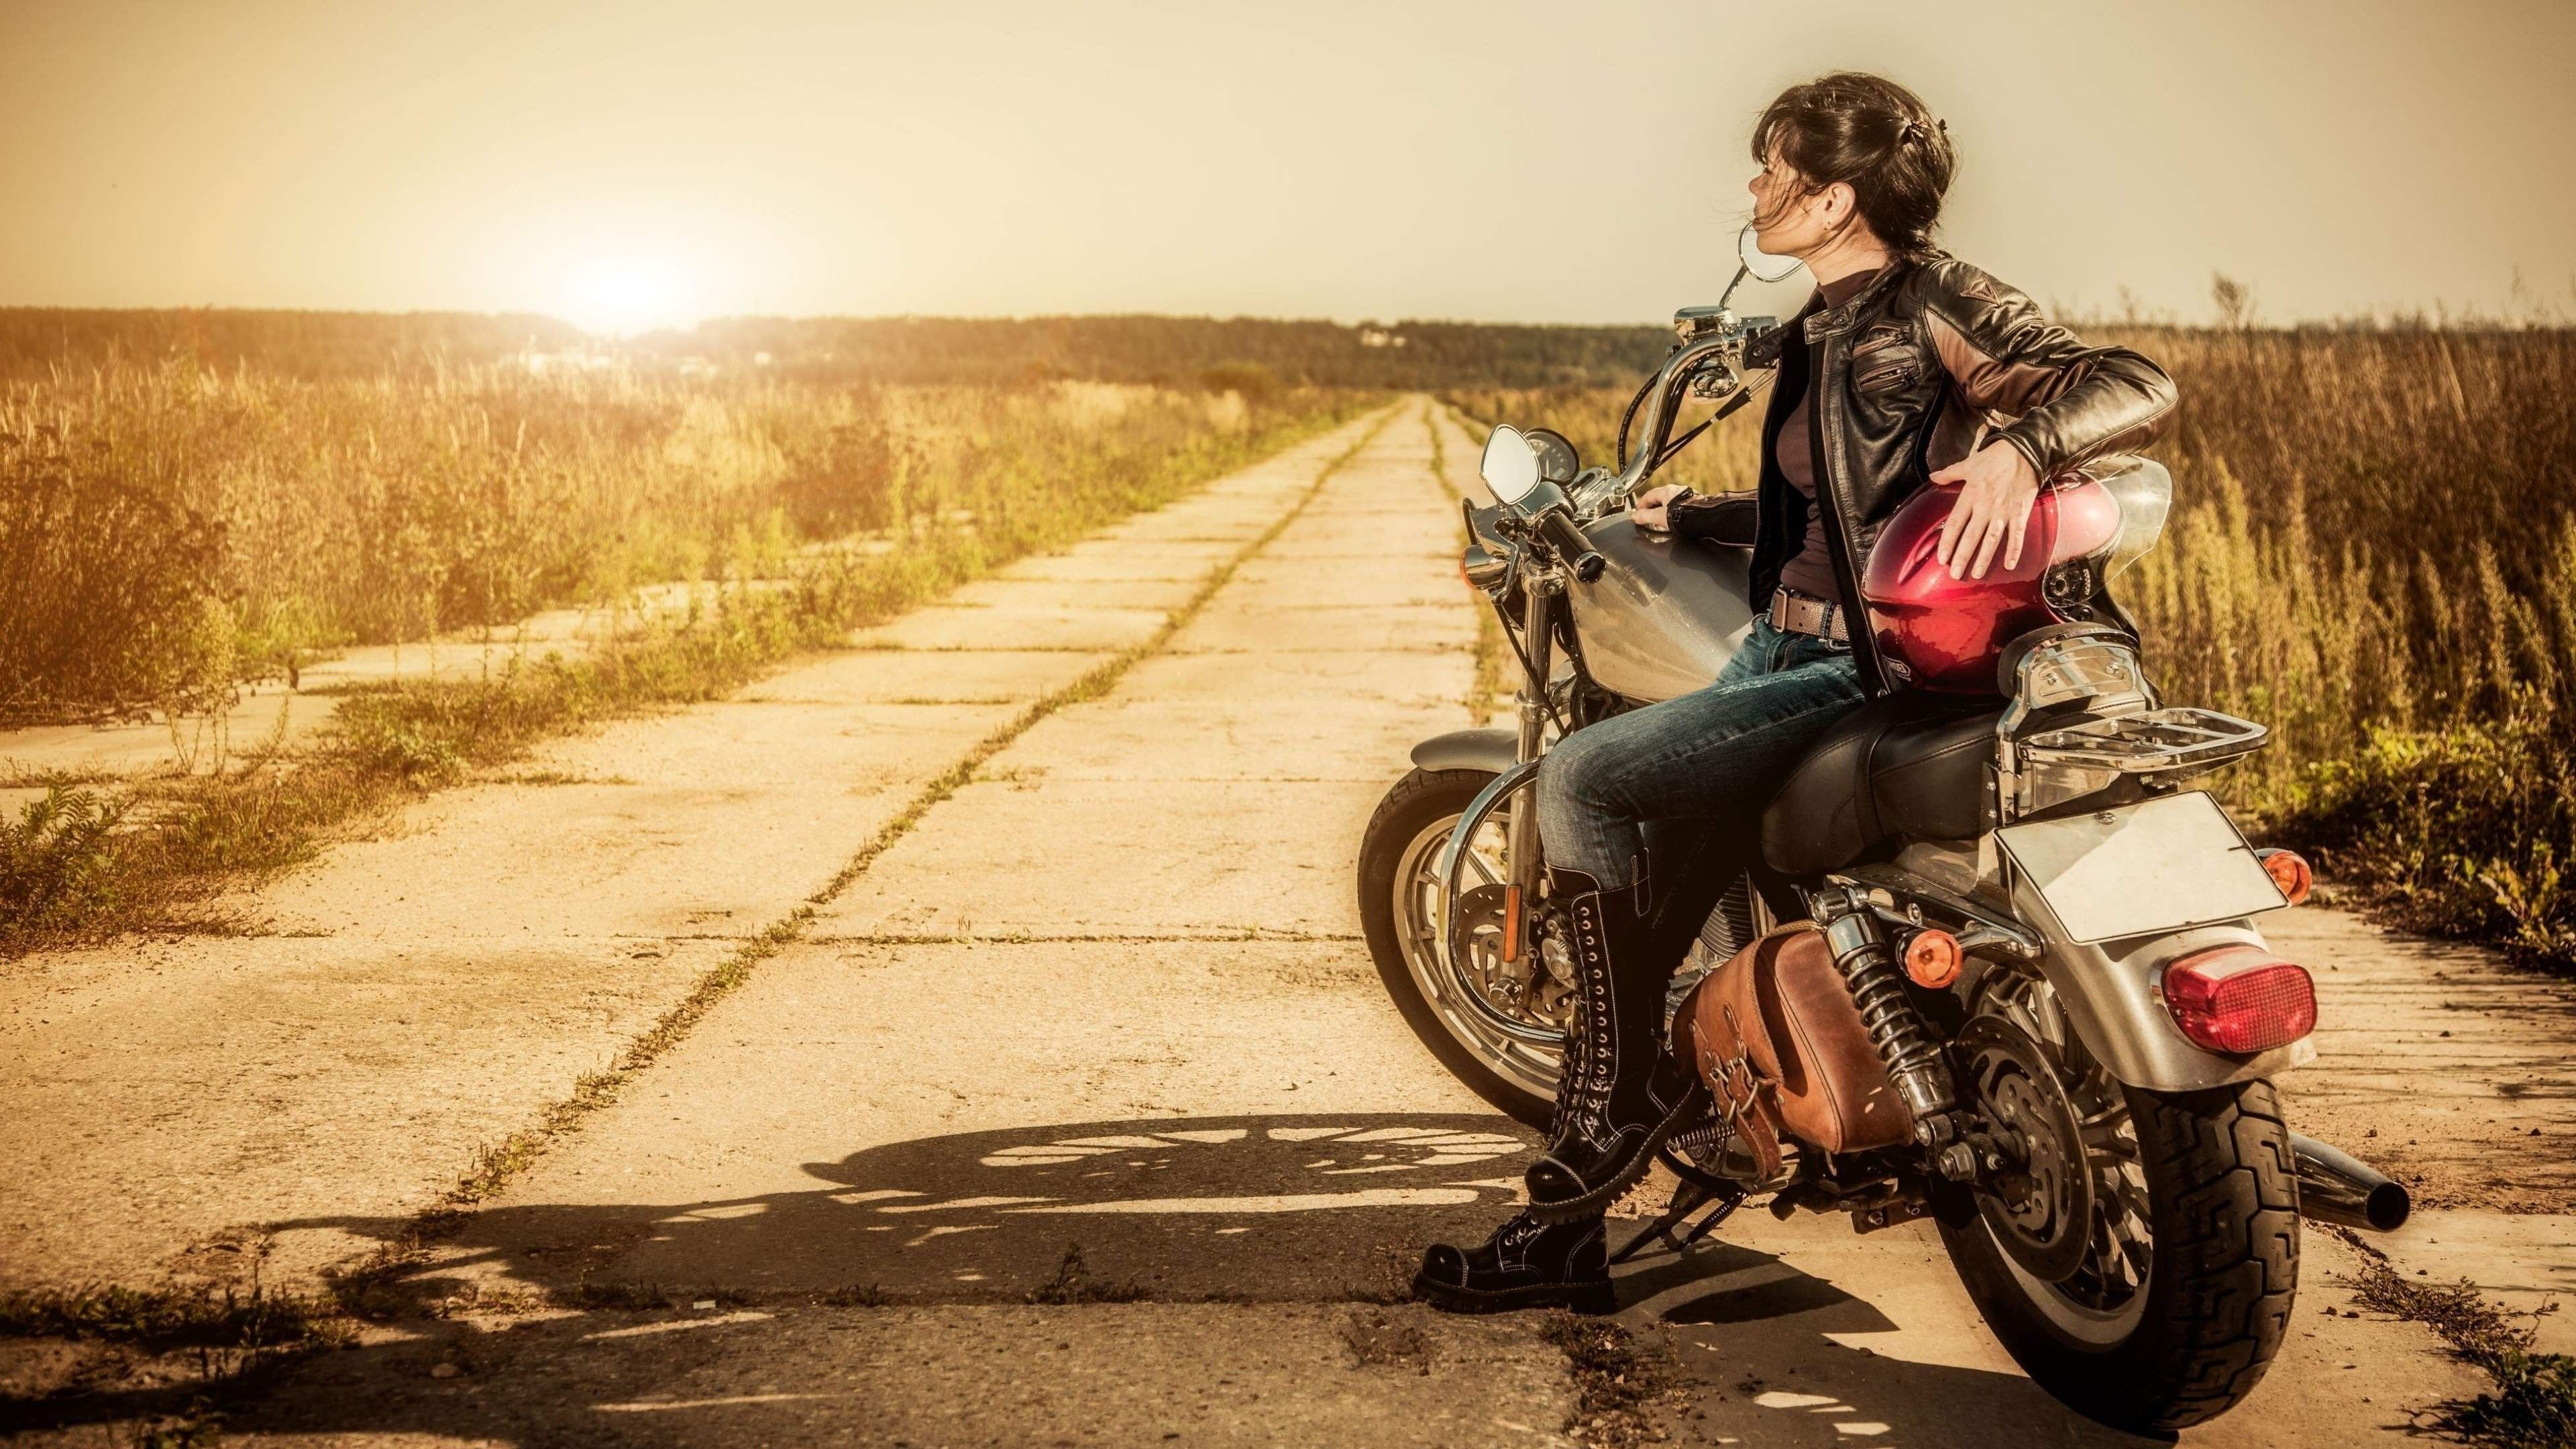 Biker Girl 4k Ultra Hd Wallpaper Biker Girl 2217249 Hd Wallpaper Backgrounds Download